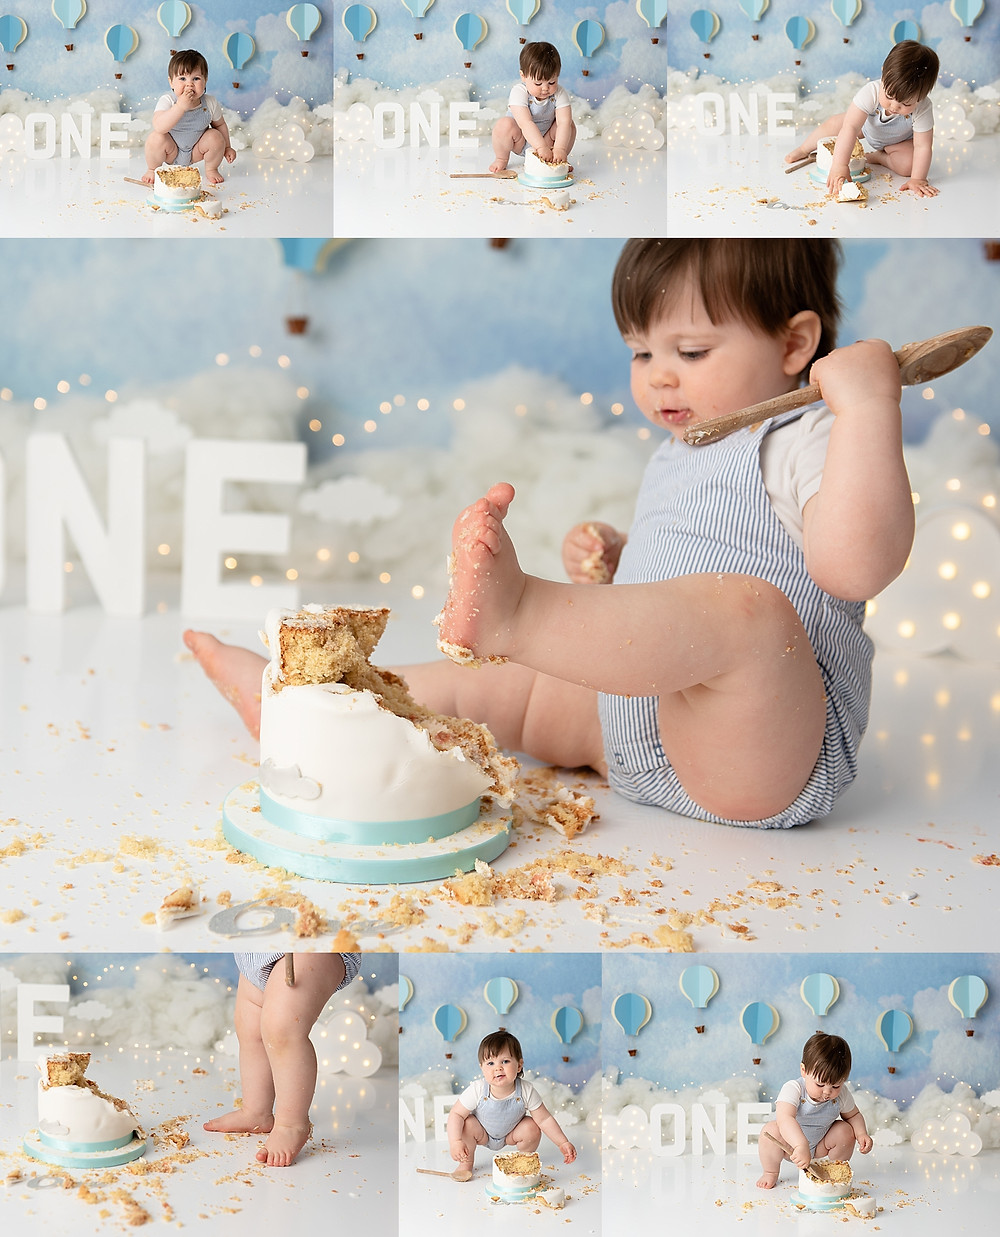 Baby boy enjoying Cake Smash Photo Shoot